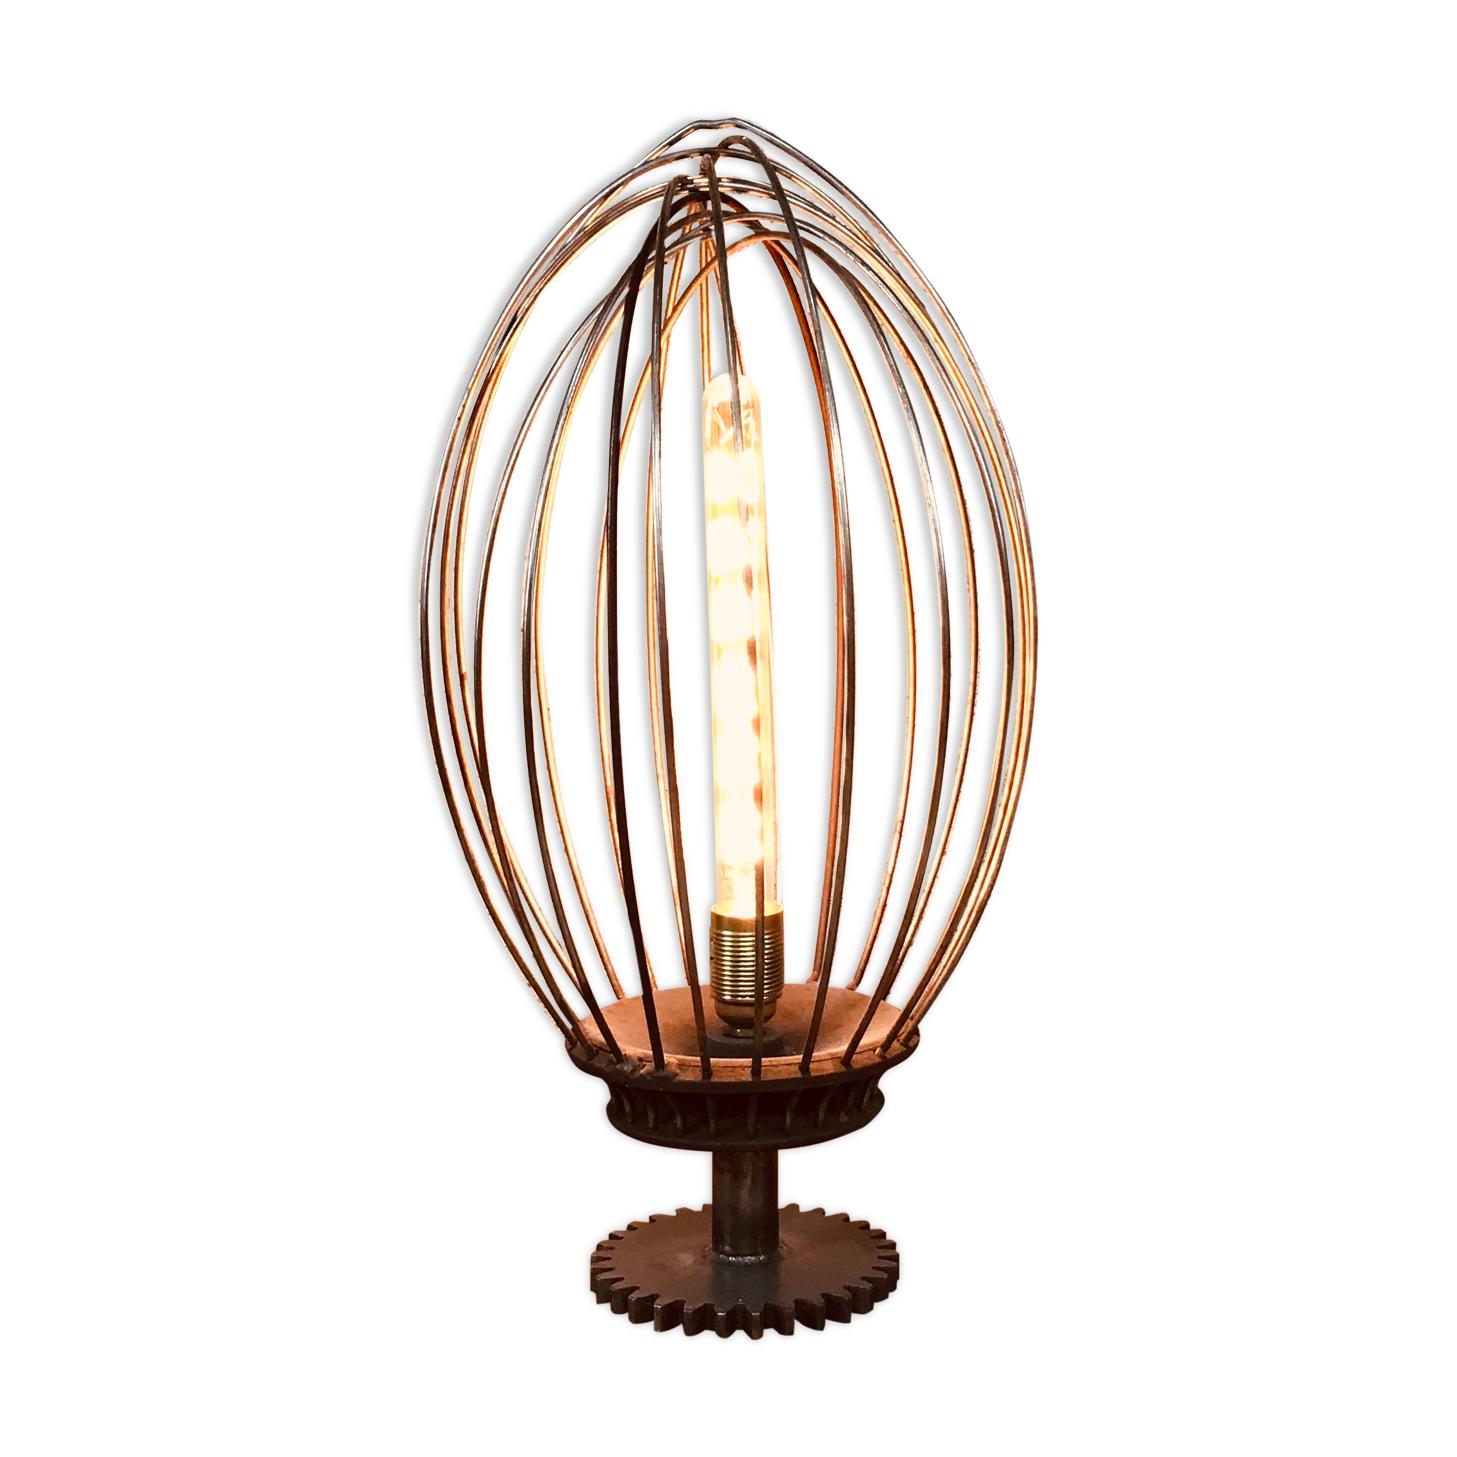 Lampe de table design patisserie batteur industriel restaurant bistrot vintage